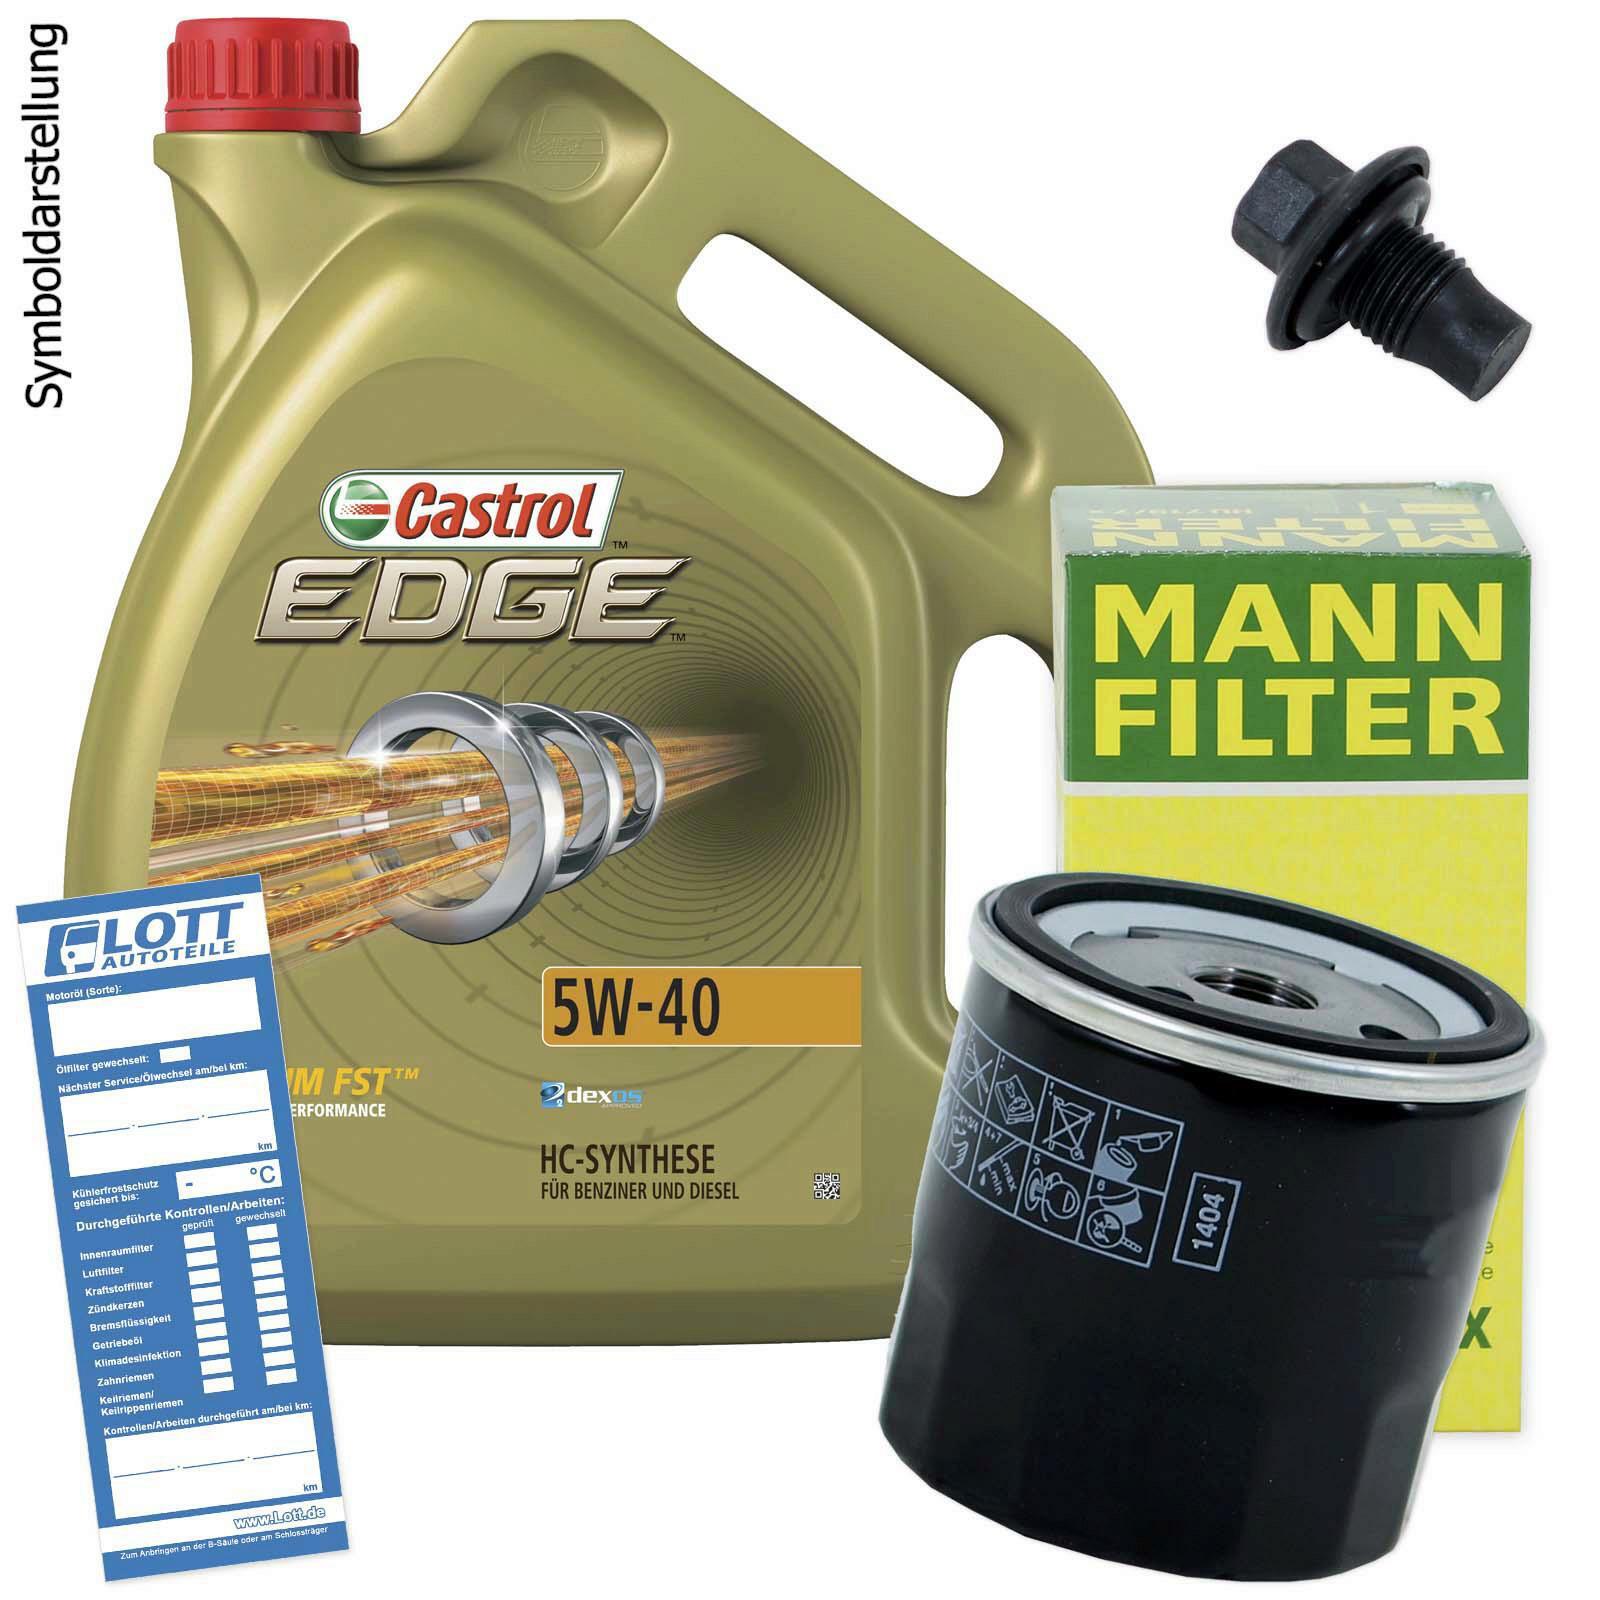 Ölwechsel Set 5L 5W-40 Öl Motoröl CASTROL + MANN Ölfilter + Ablassschraube